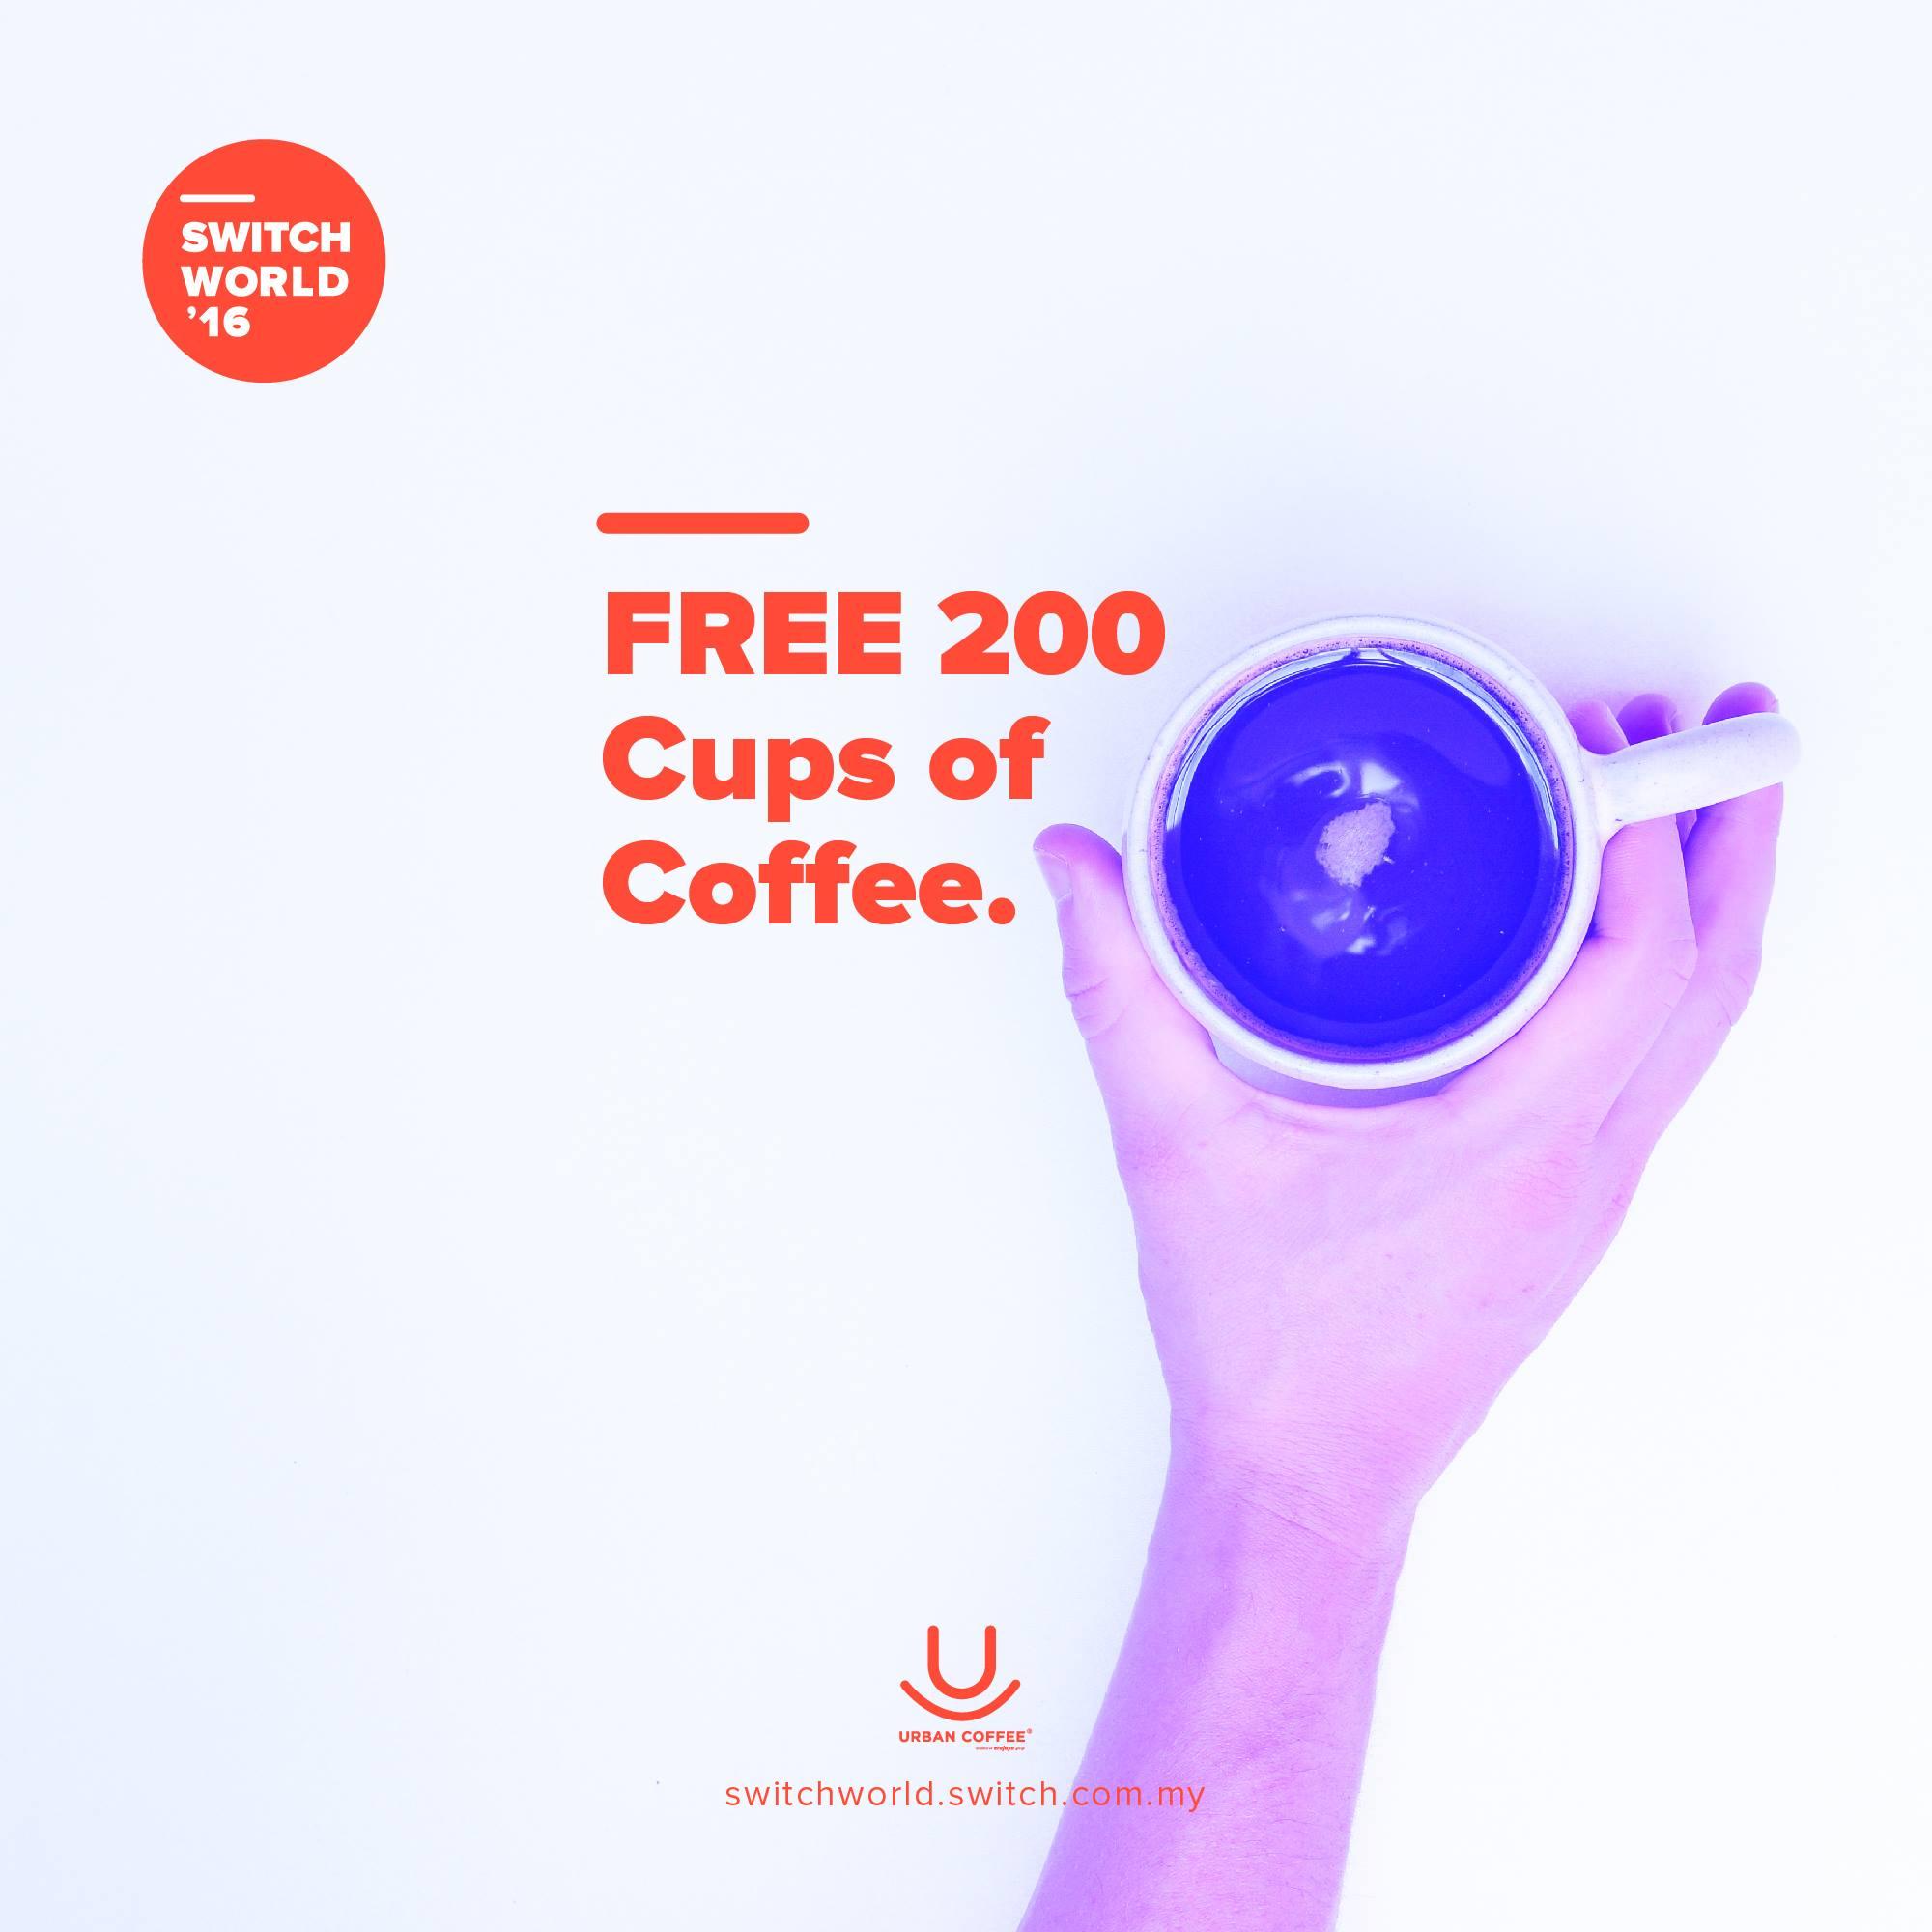 FREECOFFEEGiveaway SwitchWorld